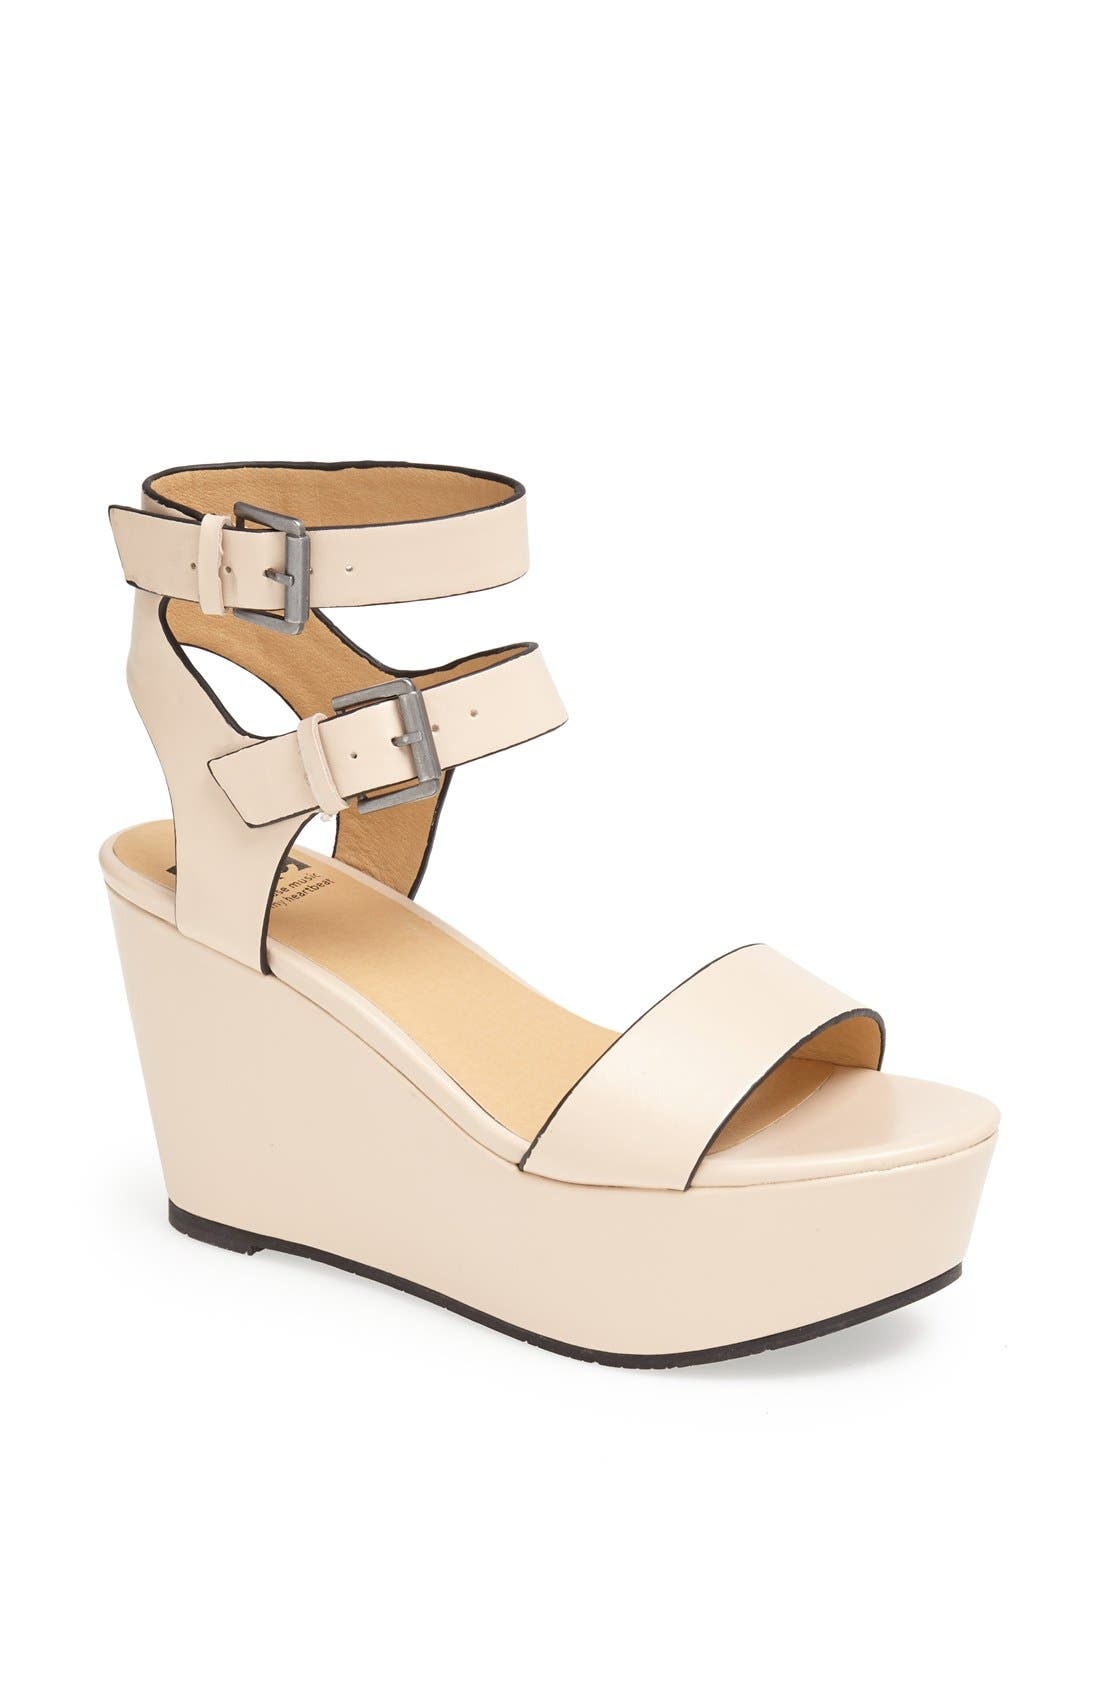 Alternate Image 1 Selected - BC Footwear 'Caught Up' Sandal